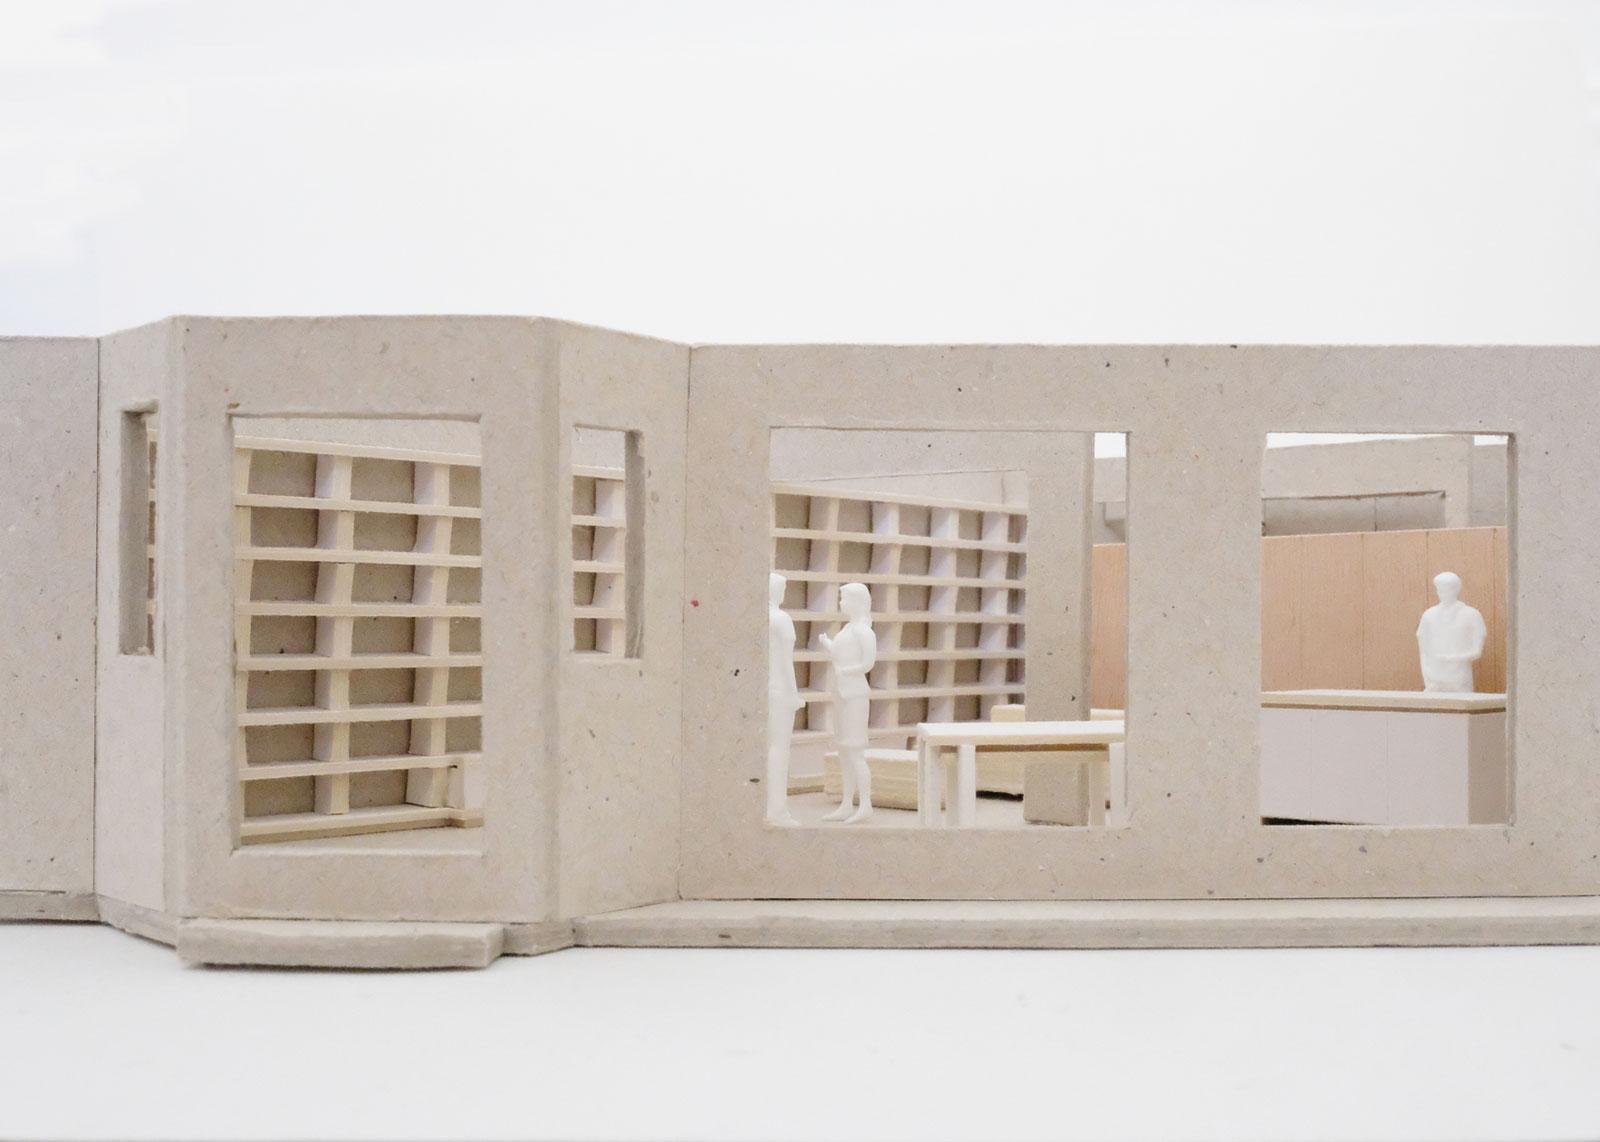 appartement S - heros architecture appartement S maquette